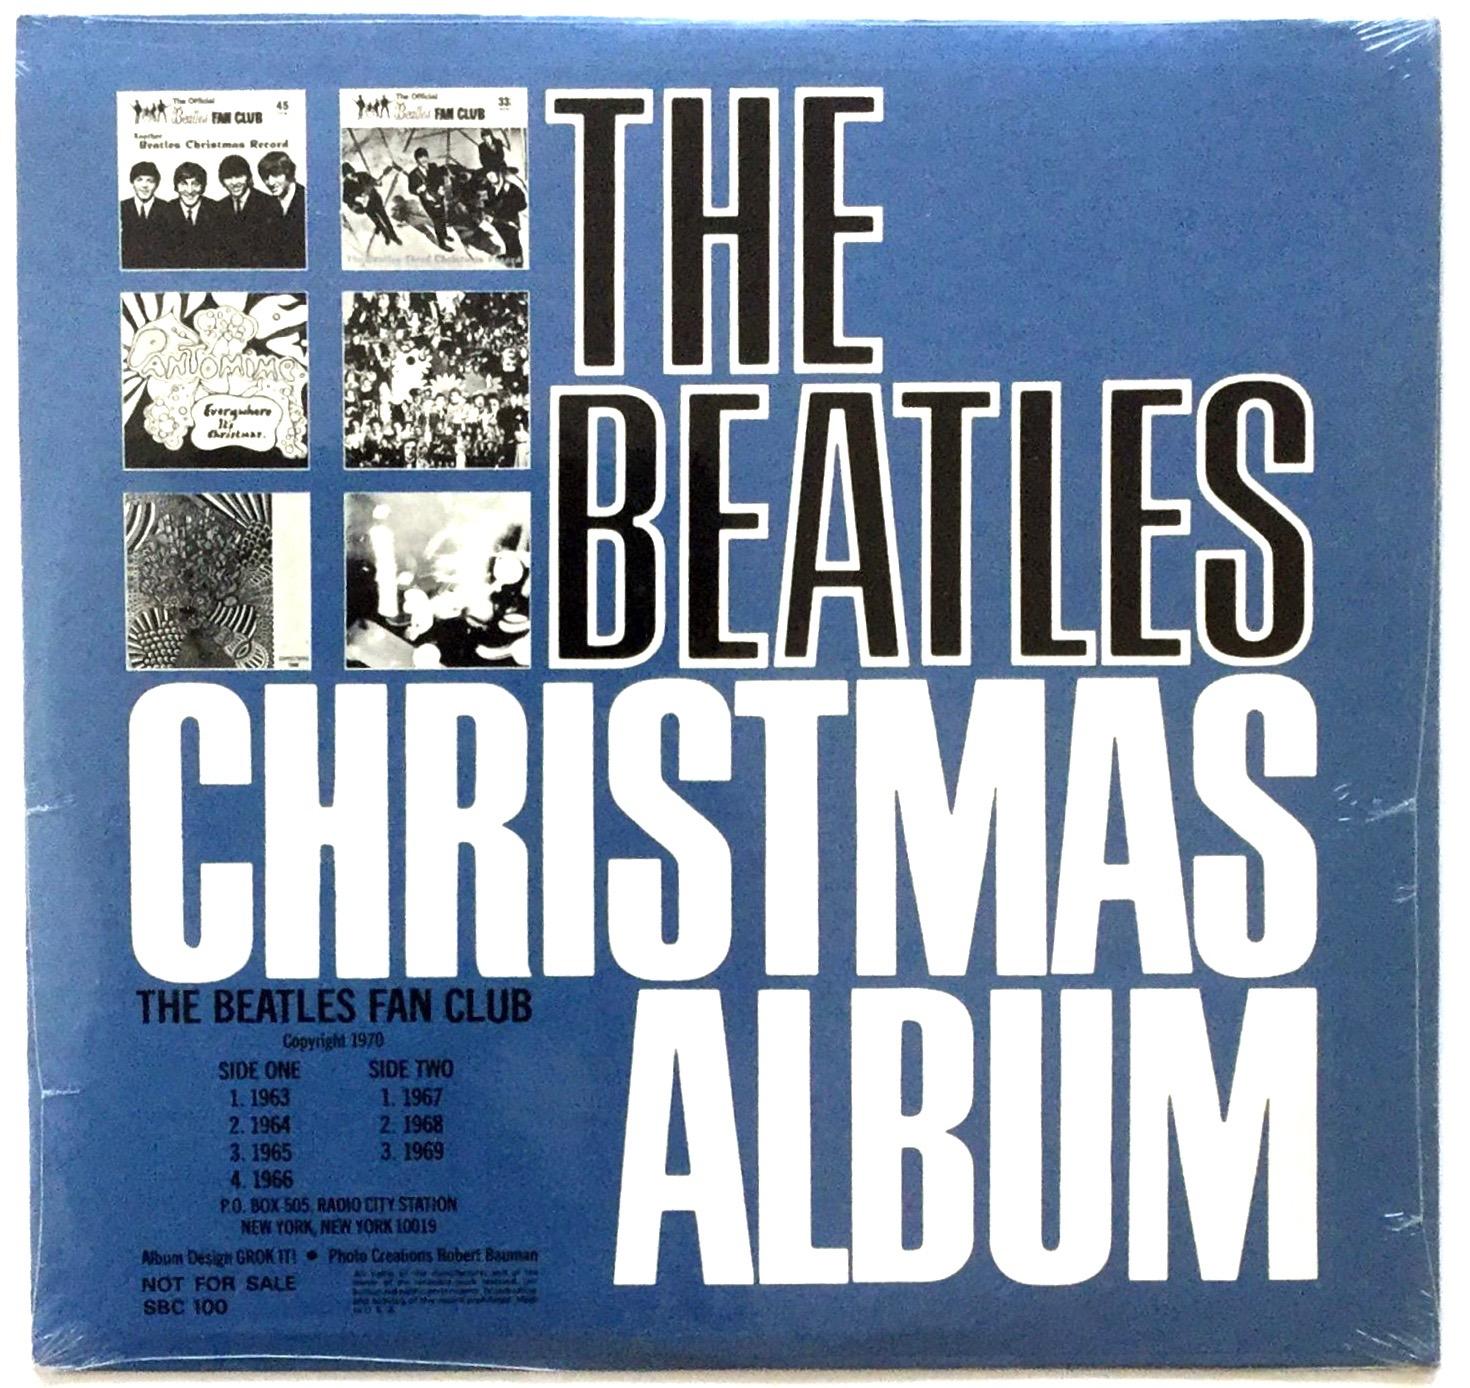 THE BEATLES CHRISTMAS ALBUM - THE BEATLES - Reviews, music